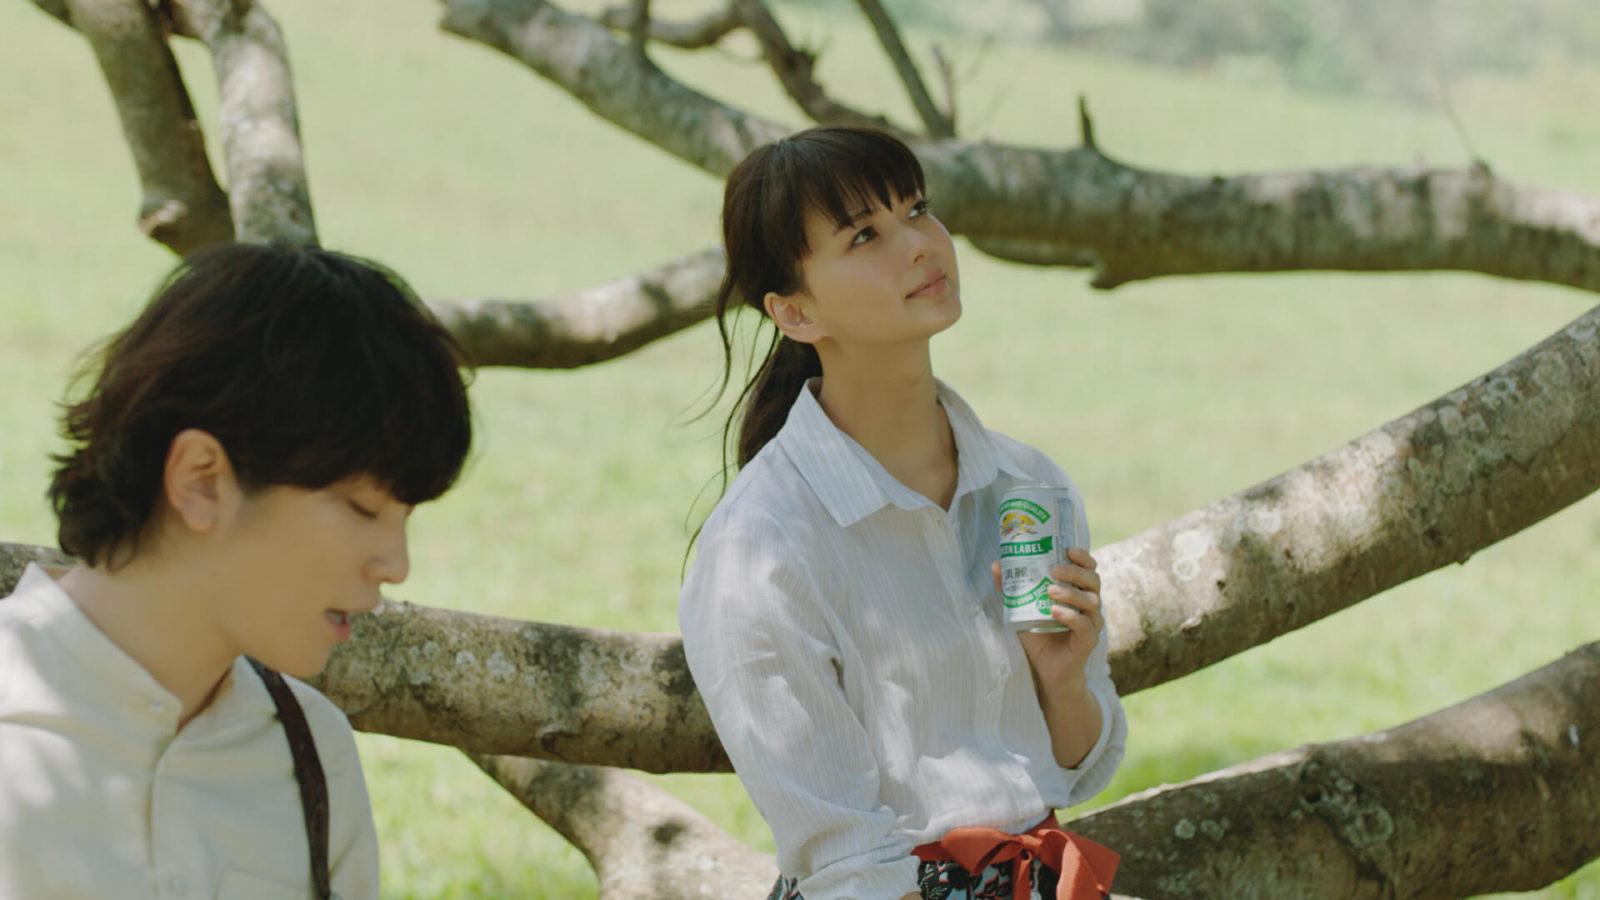 SEKAI NO OWARI Fukaseが多部未華子とCM共演!ソロでTVCM初出演サムネイル画像